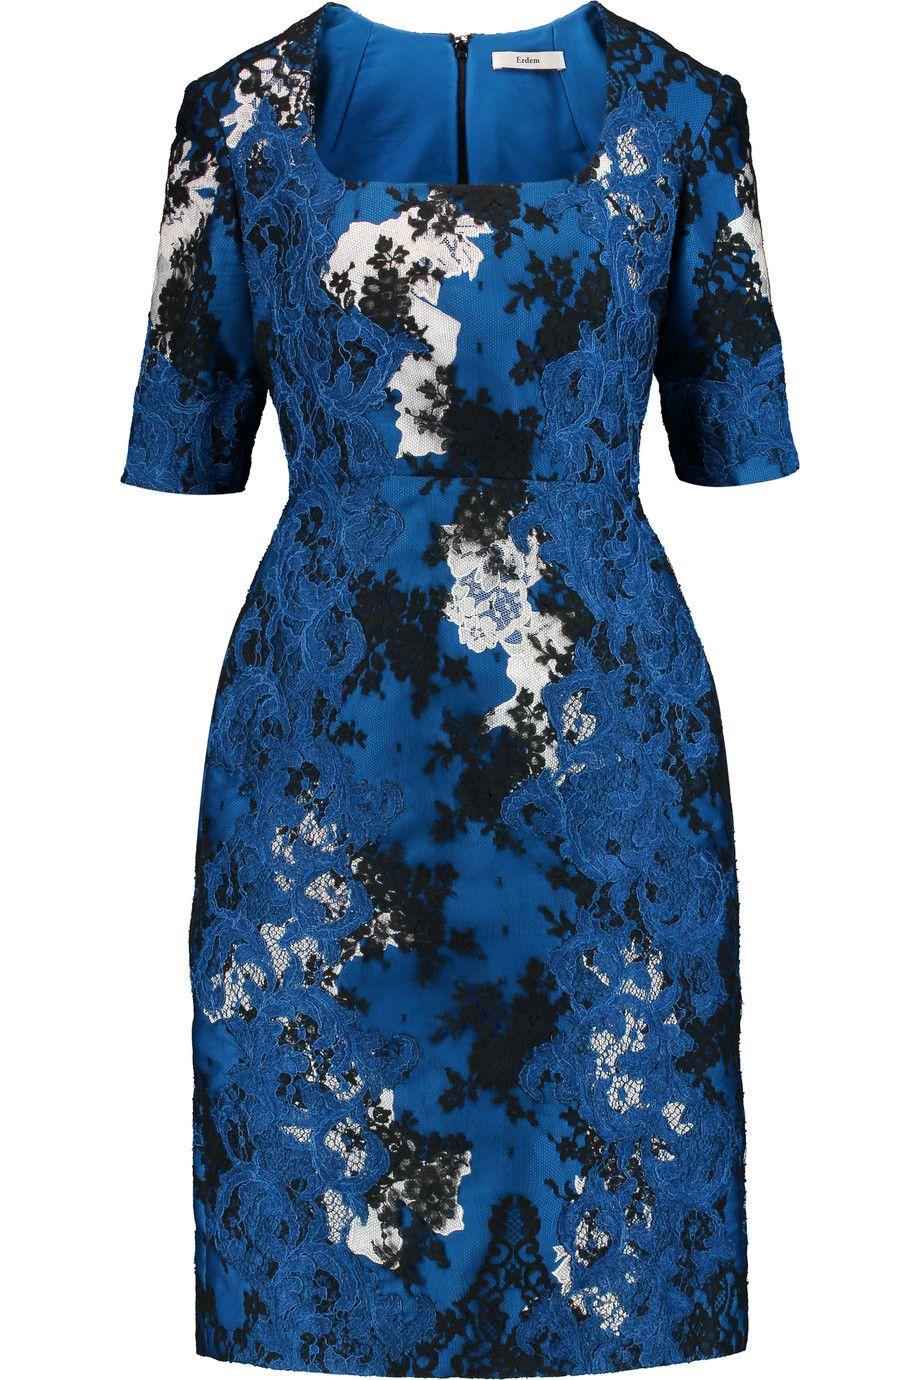 Lace dress royal blue  ERDEM Sophia SatinTwill And Corded Lace Dress erdem cloth dress